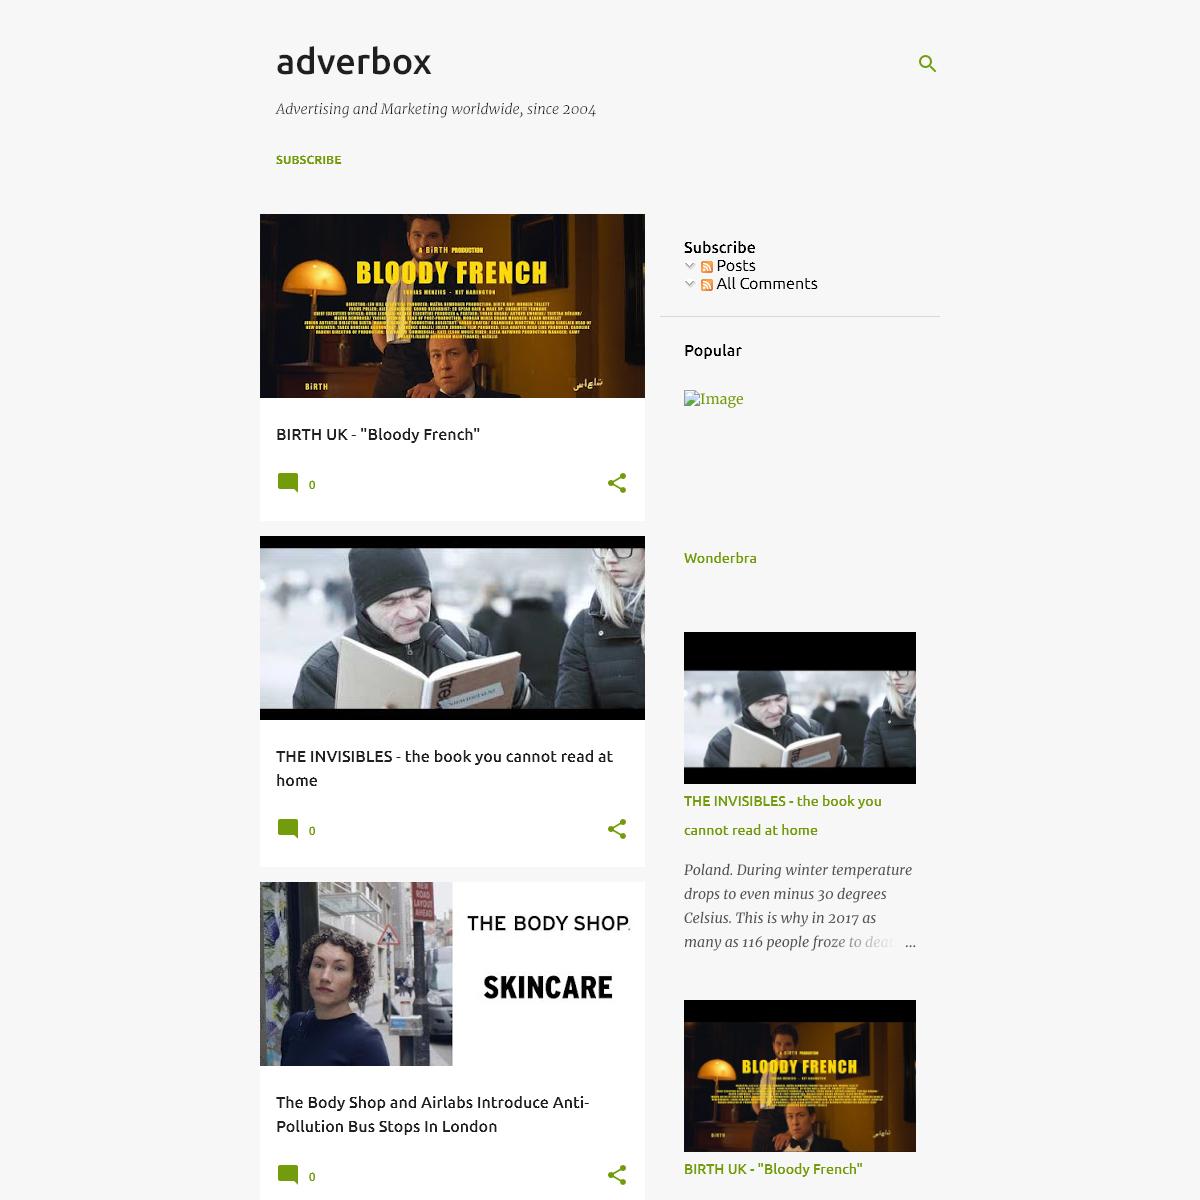 adverbox